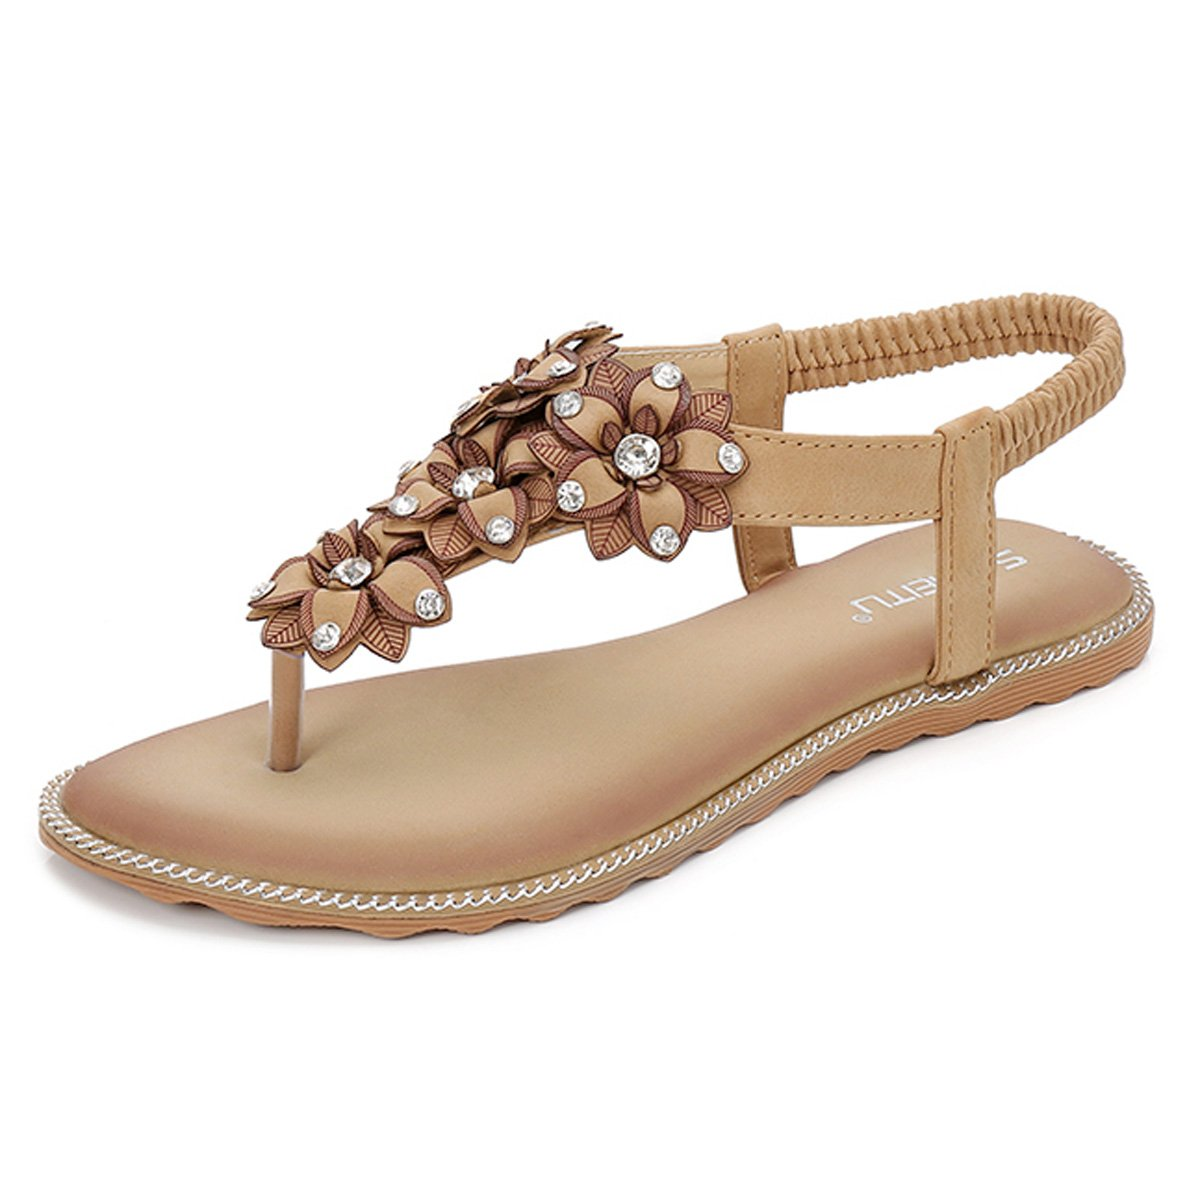 gracosy Damen Sandalen, Flip Flops Sommer Sandals Flach Zehentrenner T-Strap Offen Bouml;hmische Strand Schuhe  36 EU|Beige